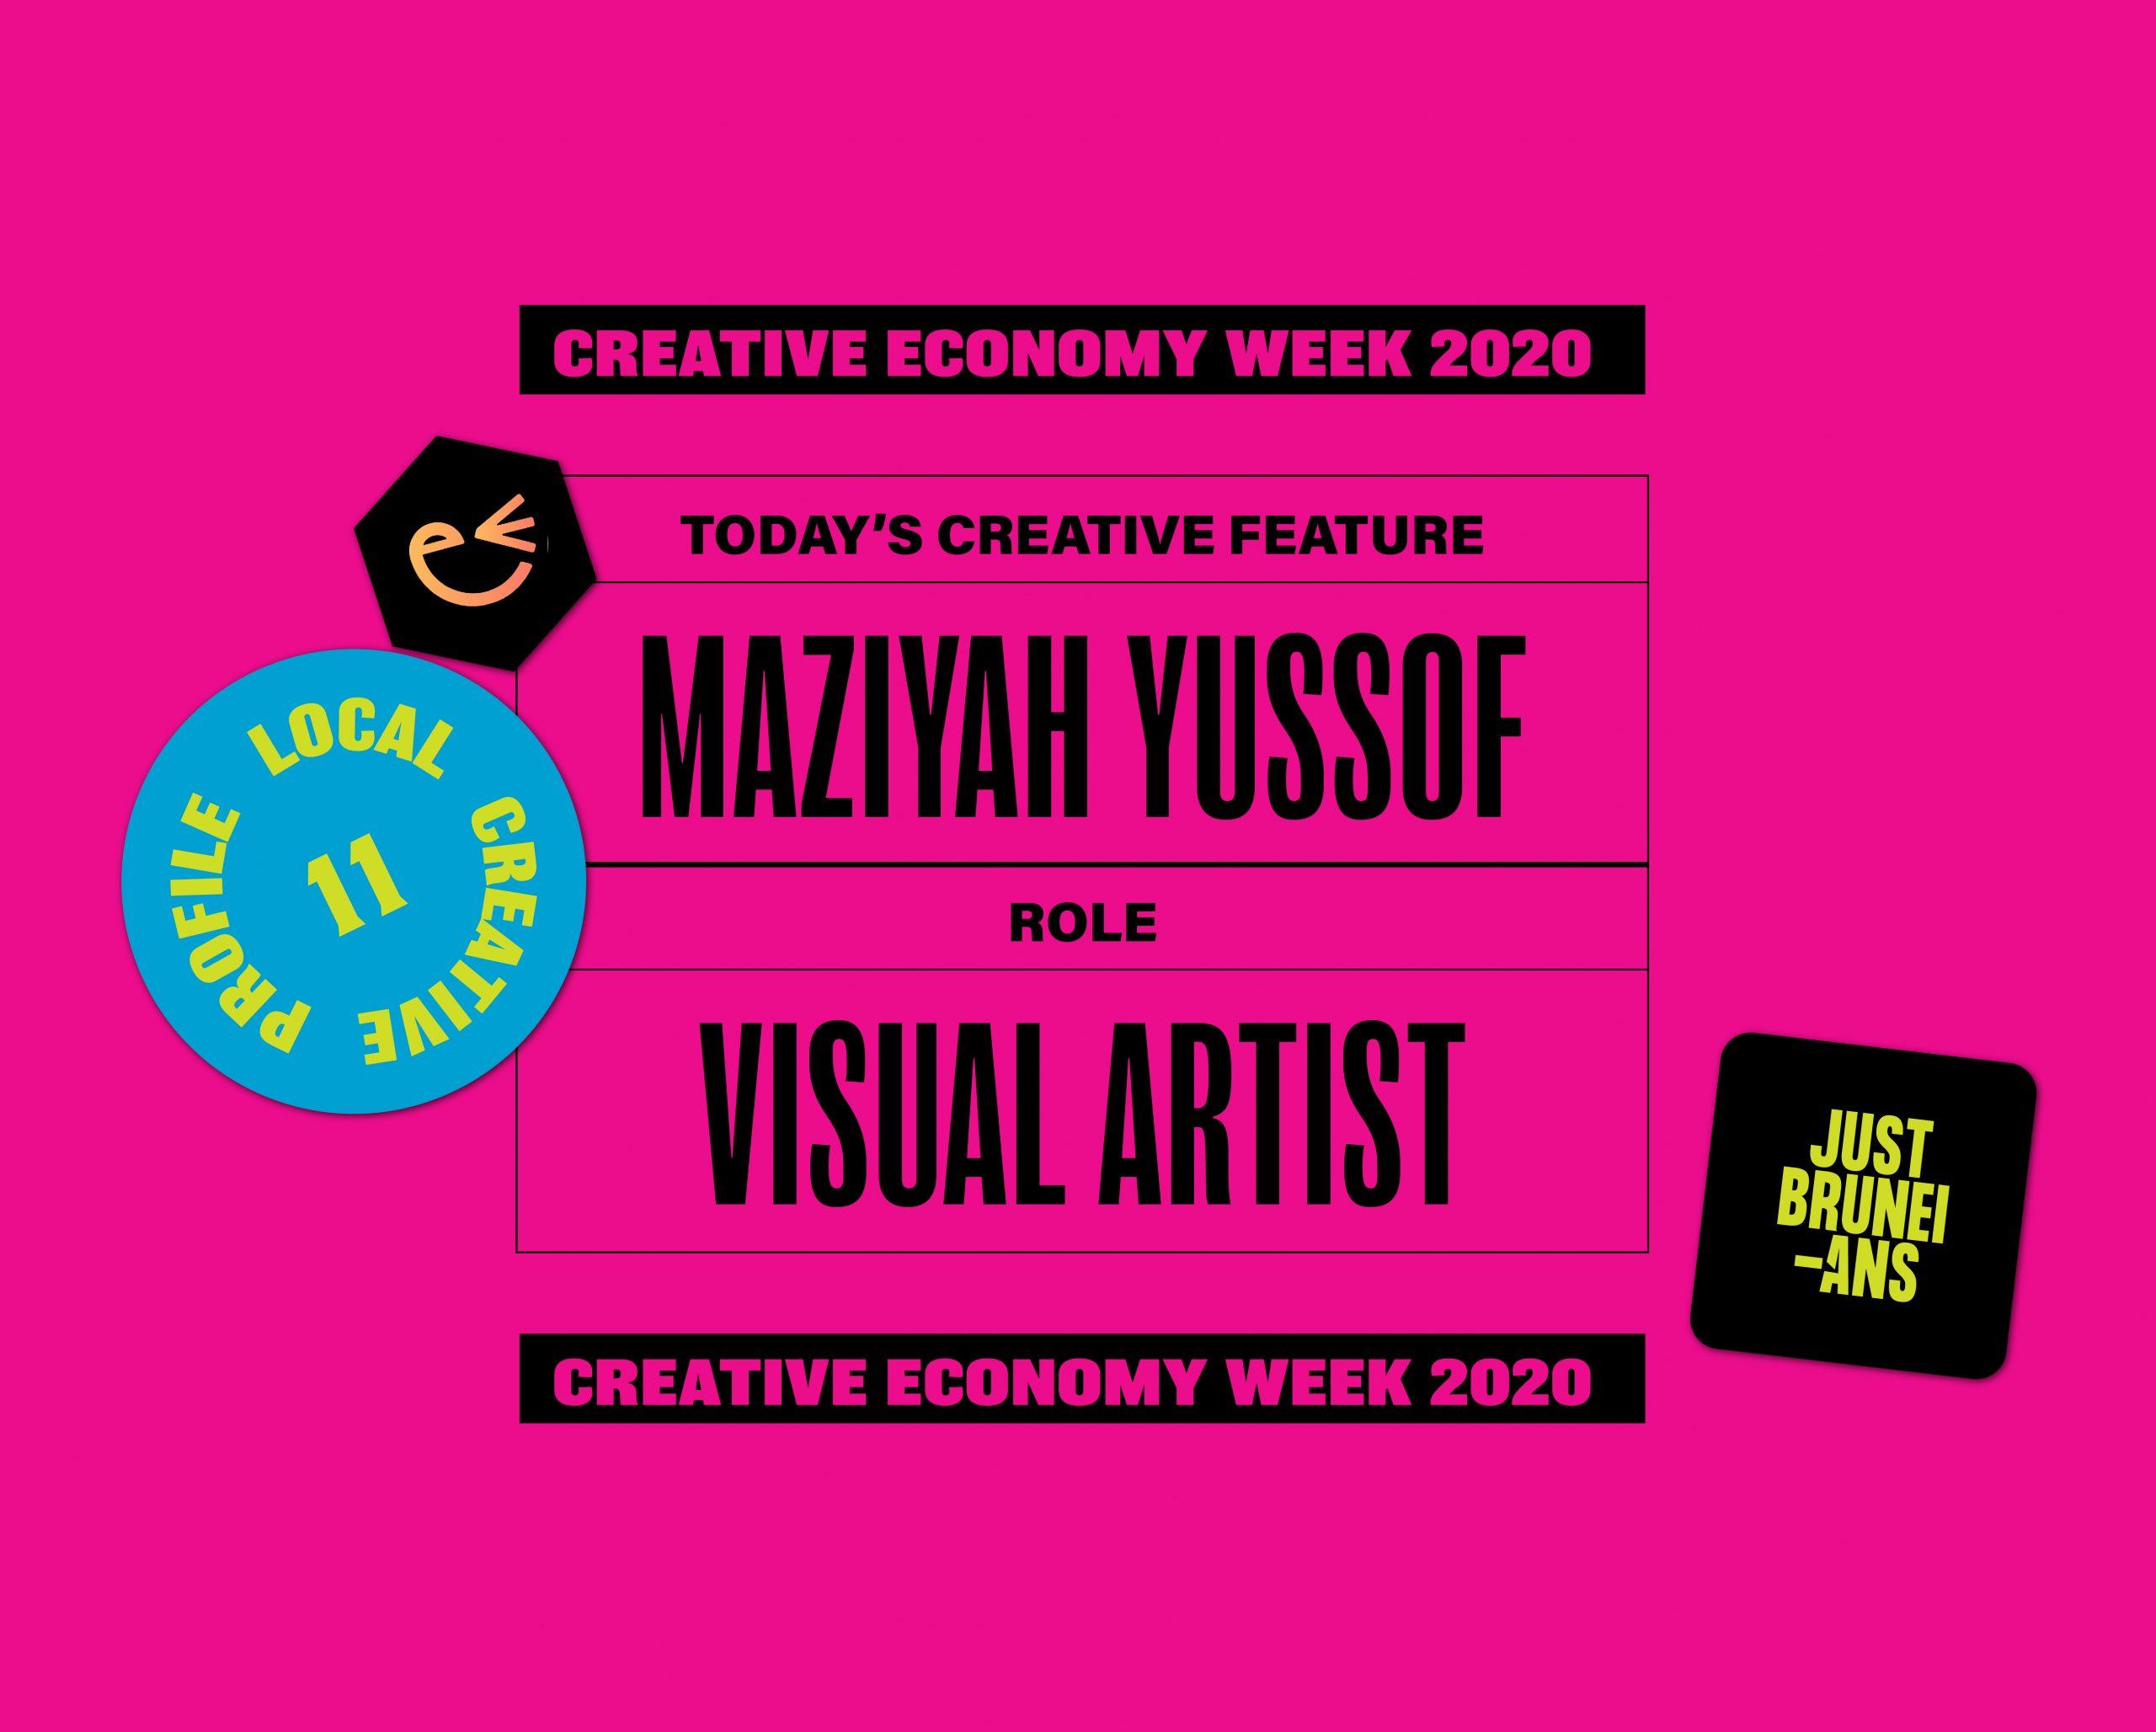 Today's Creative Feature: Maziyah Yussof | Creative Economy Week 2020